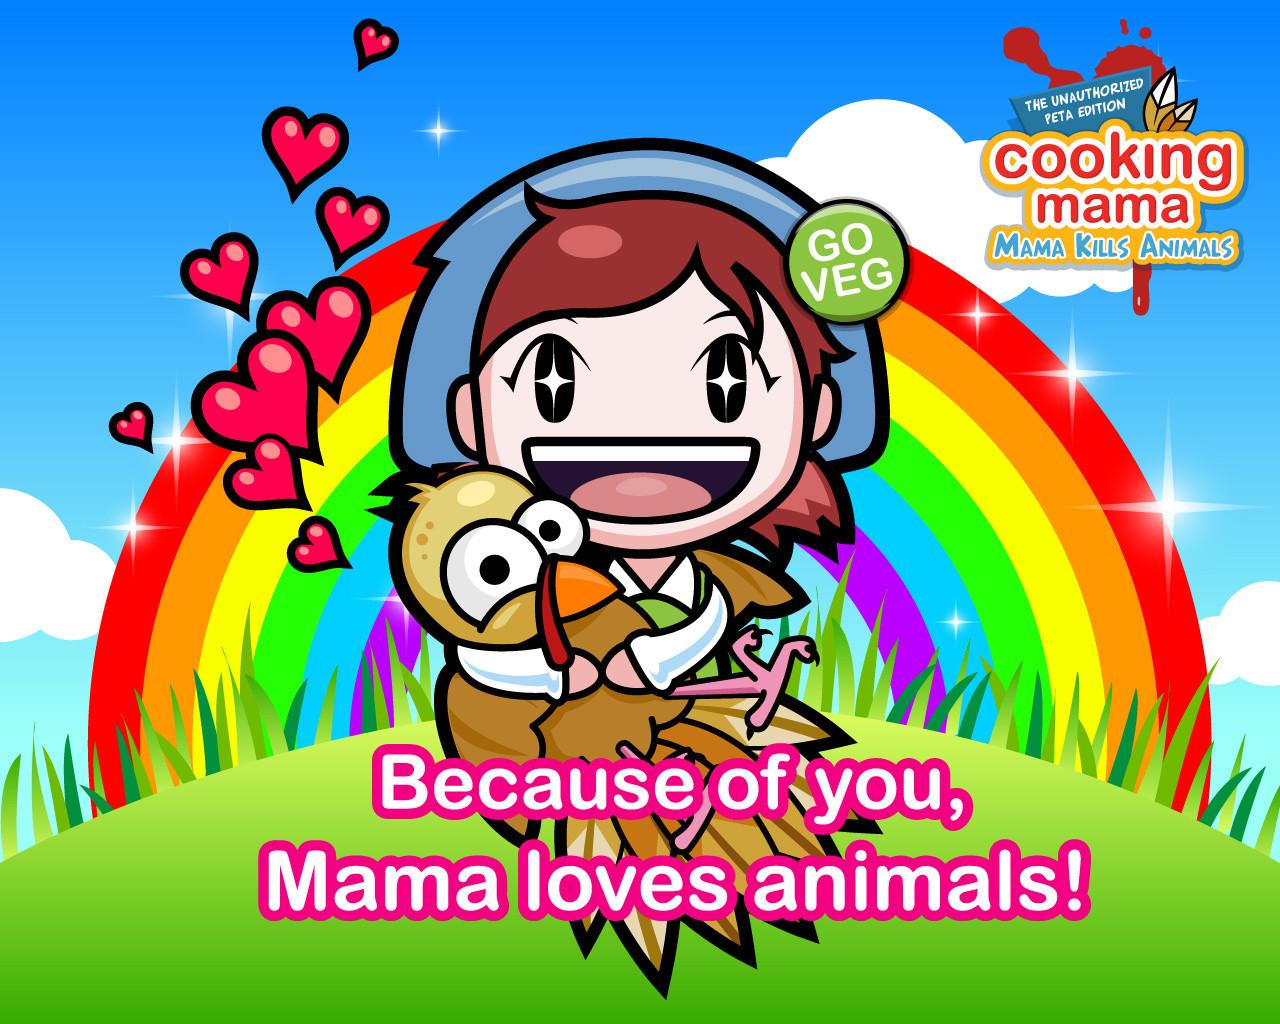 Cooking Mama Thanksgiving Turkey  PETA Spokesperson Lindsay Rajt Talks Cooking Mama Kills